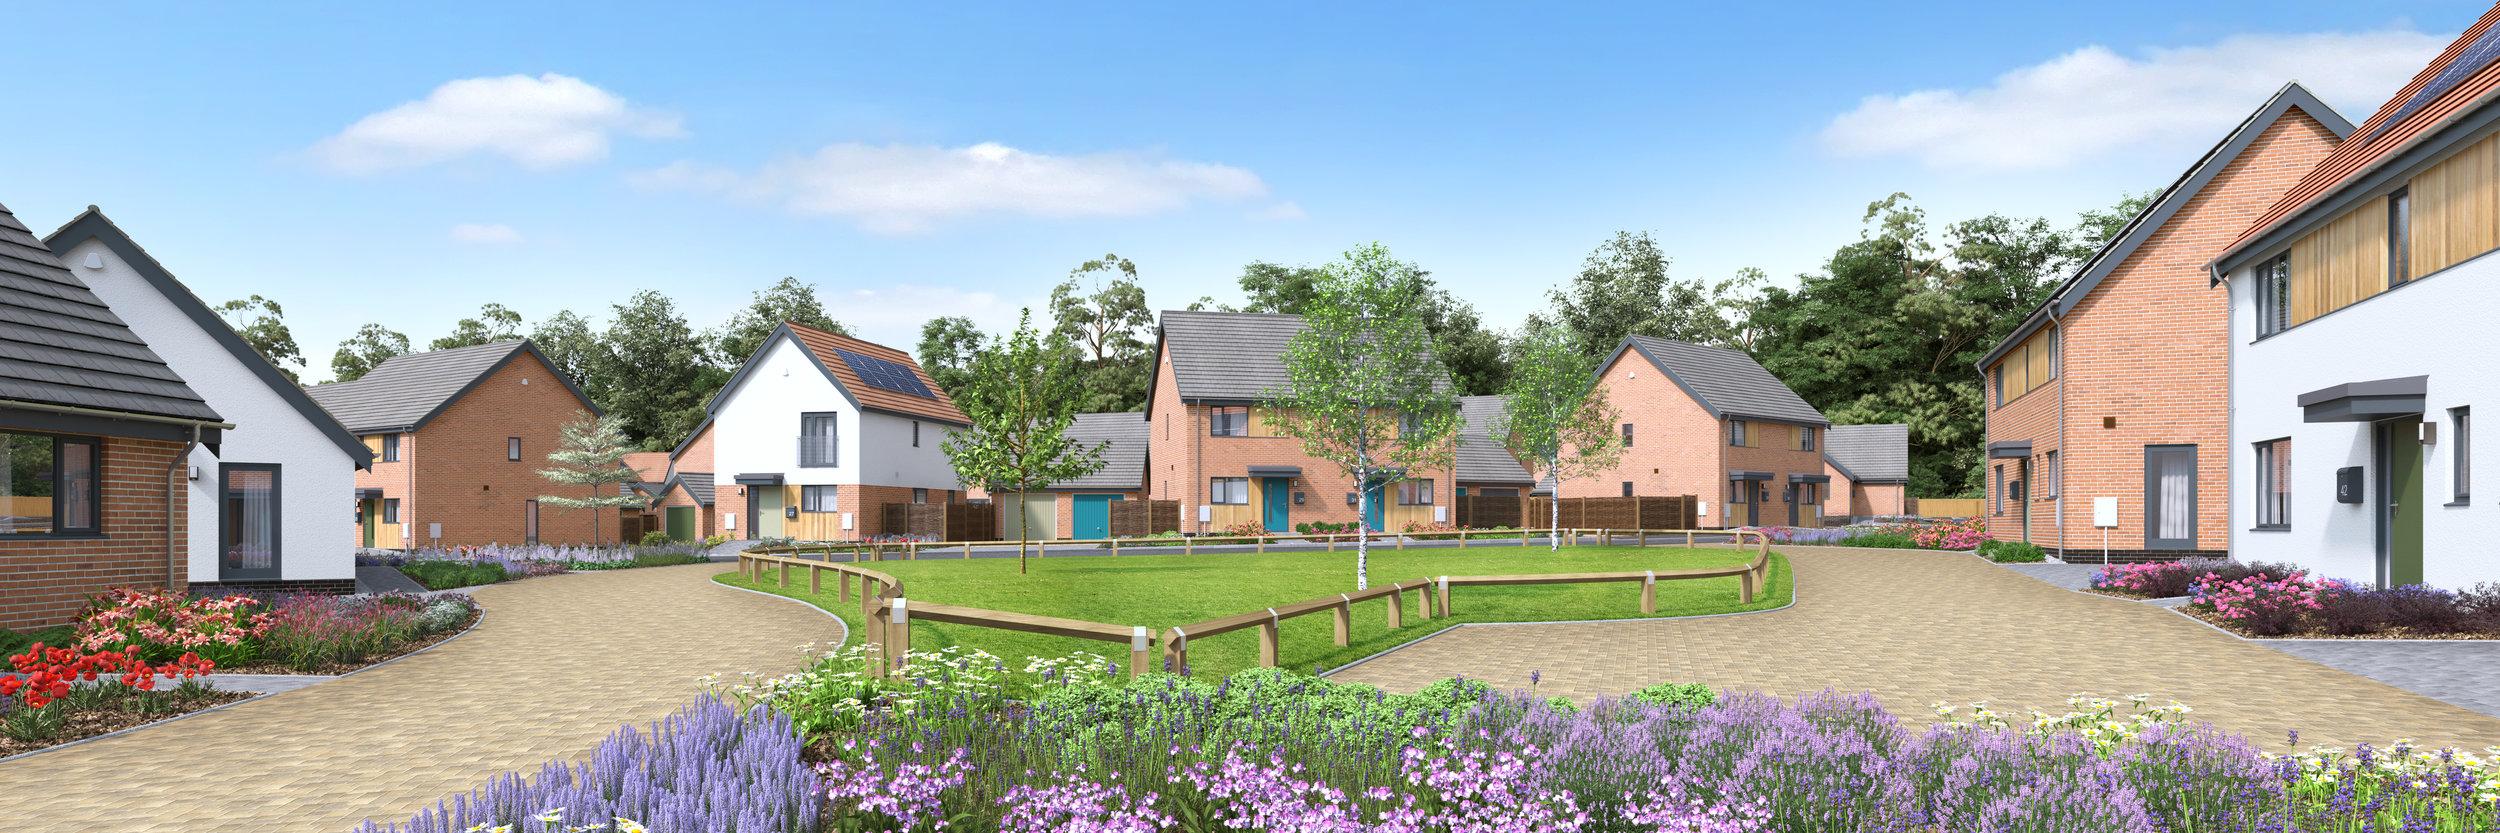 CGI Property landscaping - Norfolk.jpg